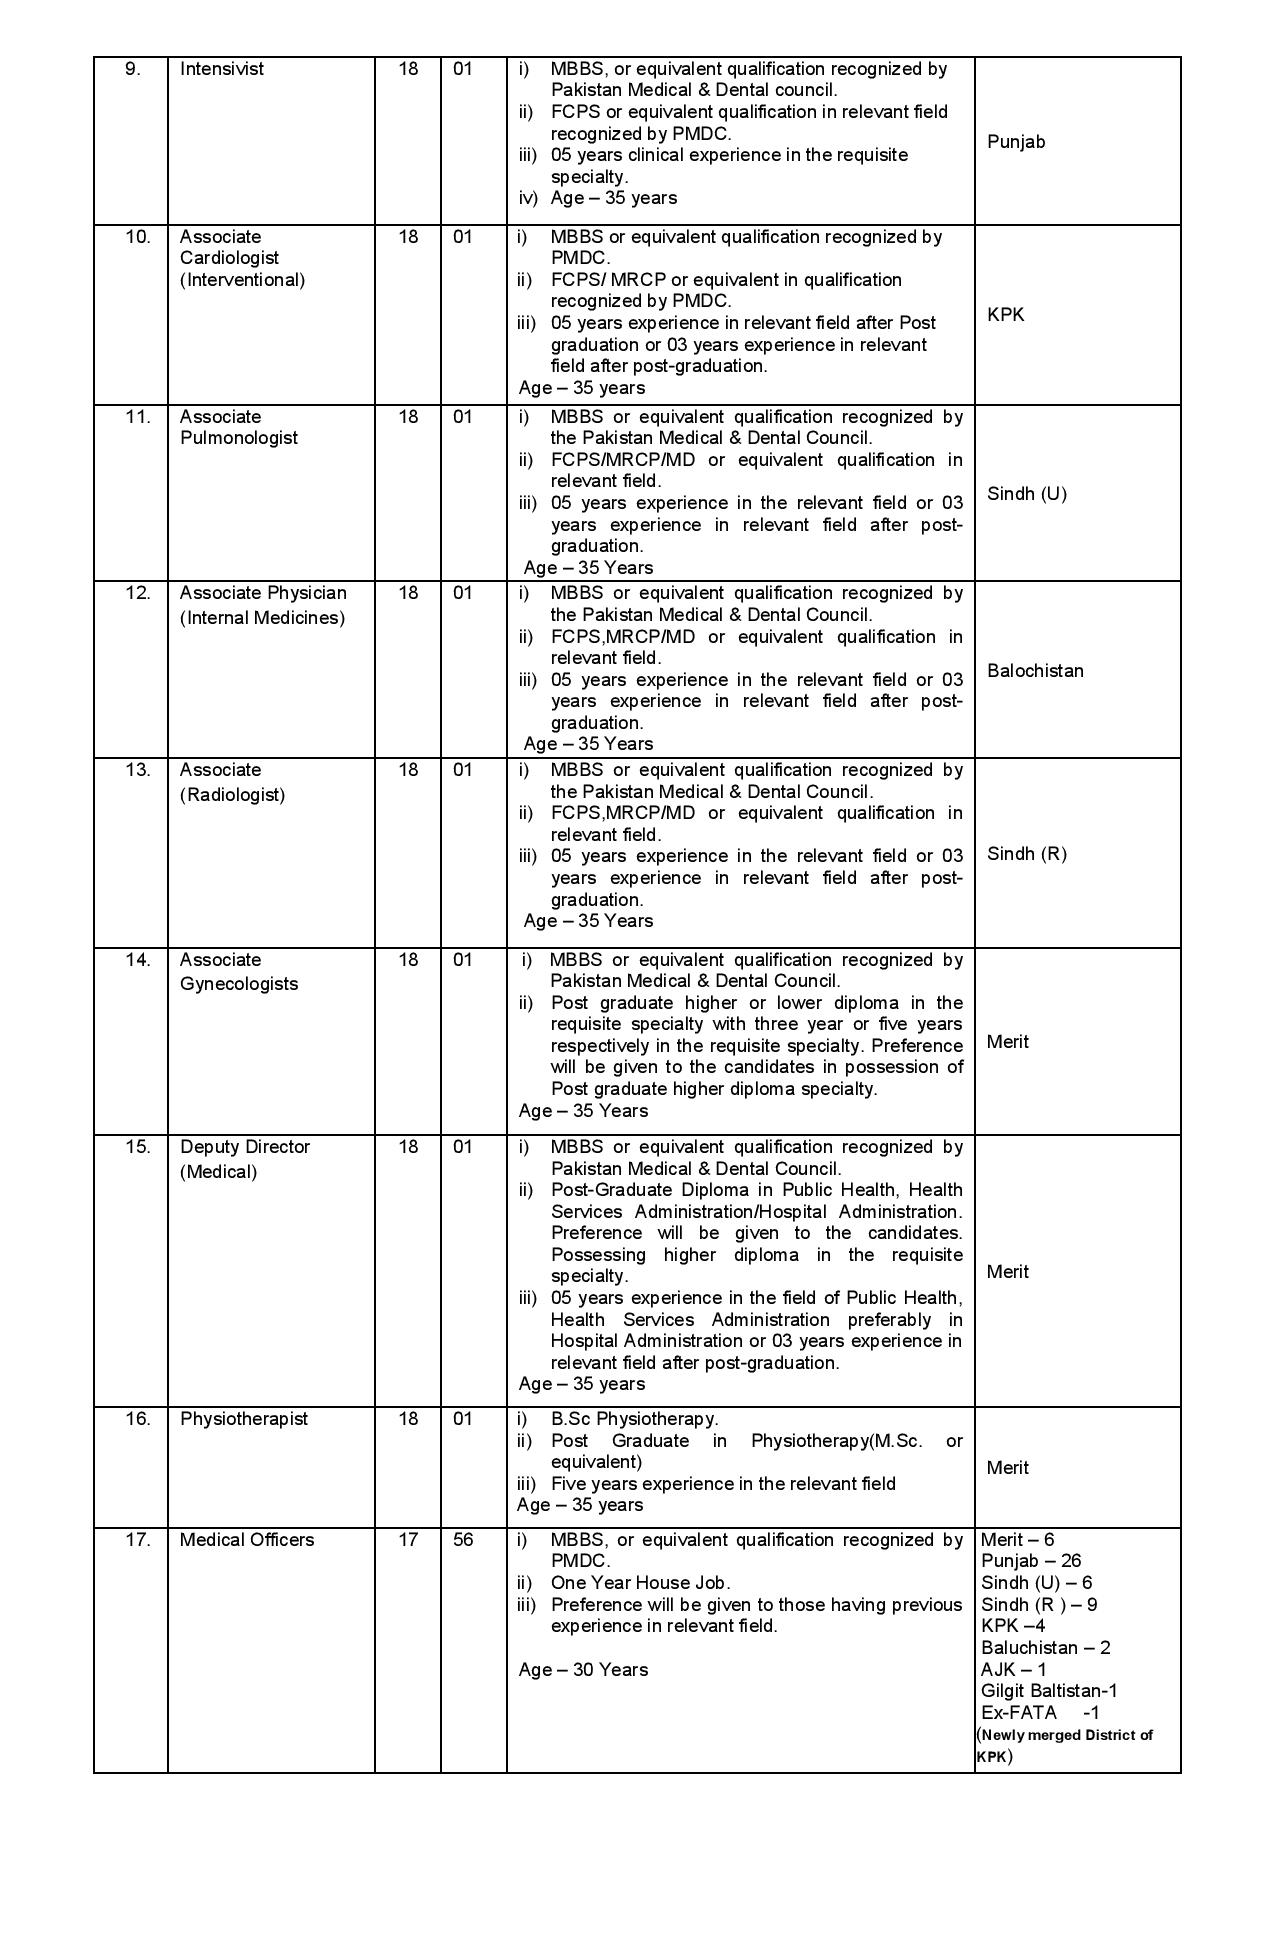 CDA jobs - Capital Development Authority (CDA) Jobs 2021